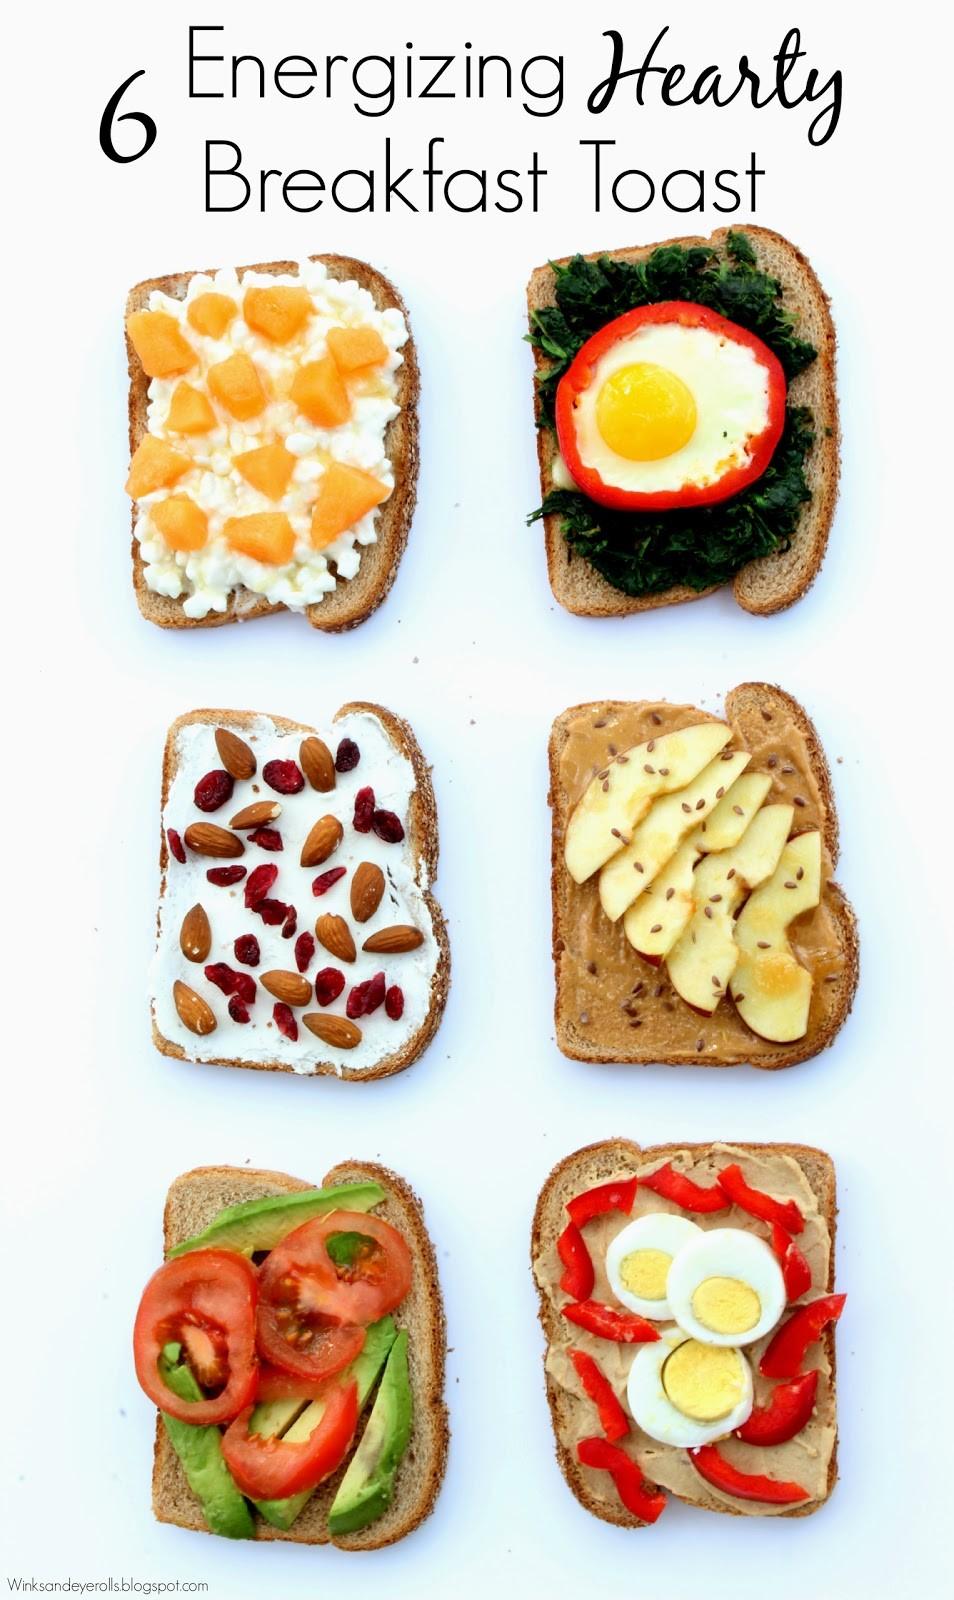 6 Energizing Hearty Breakfast Toast